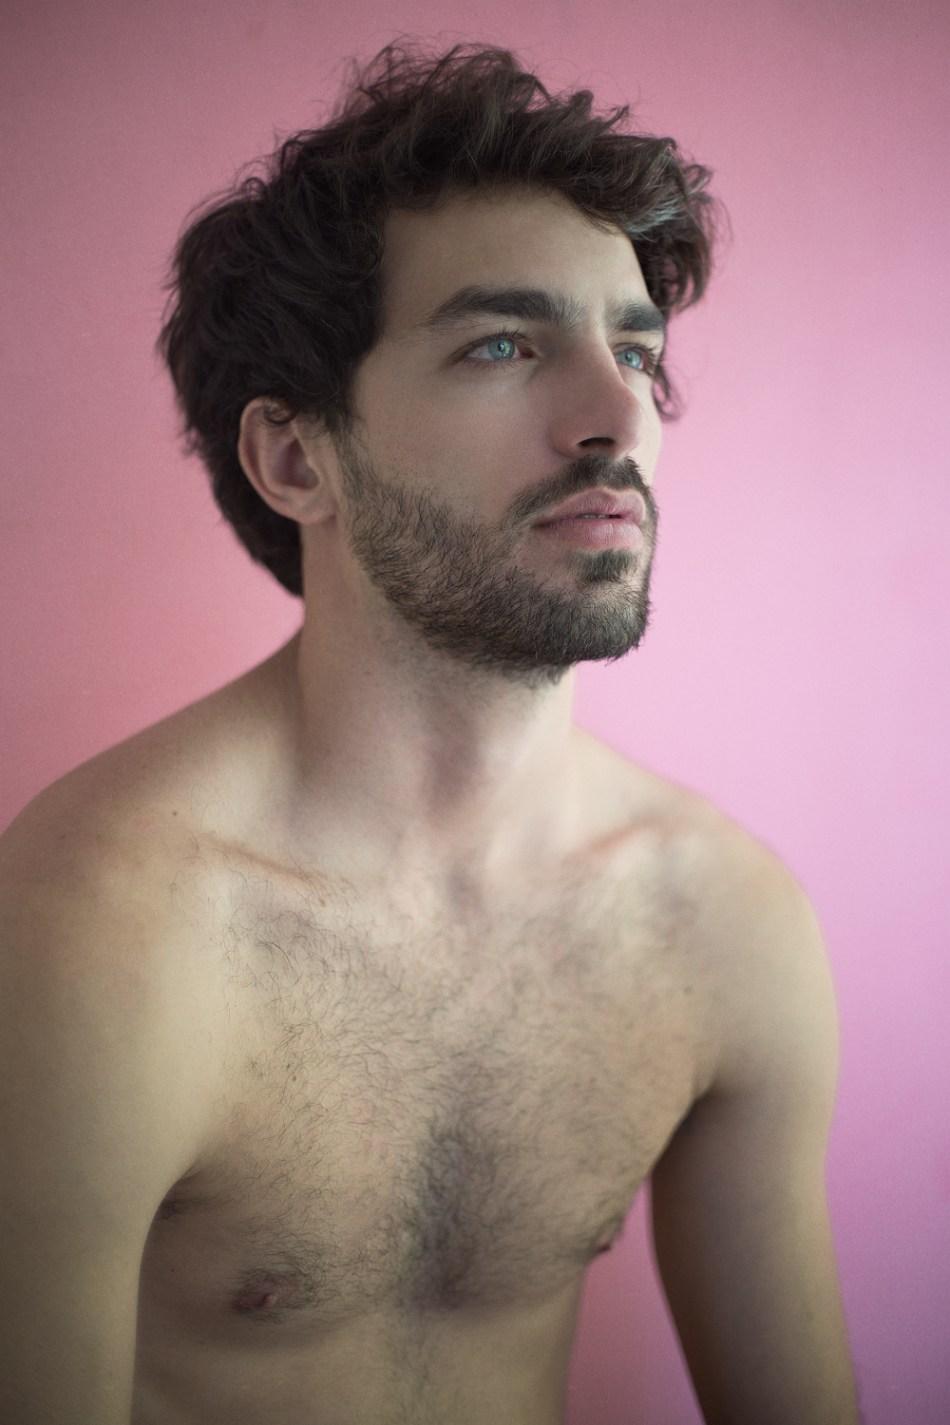 Andre Alburquenque by Rene de la Cruz (3)